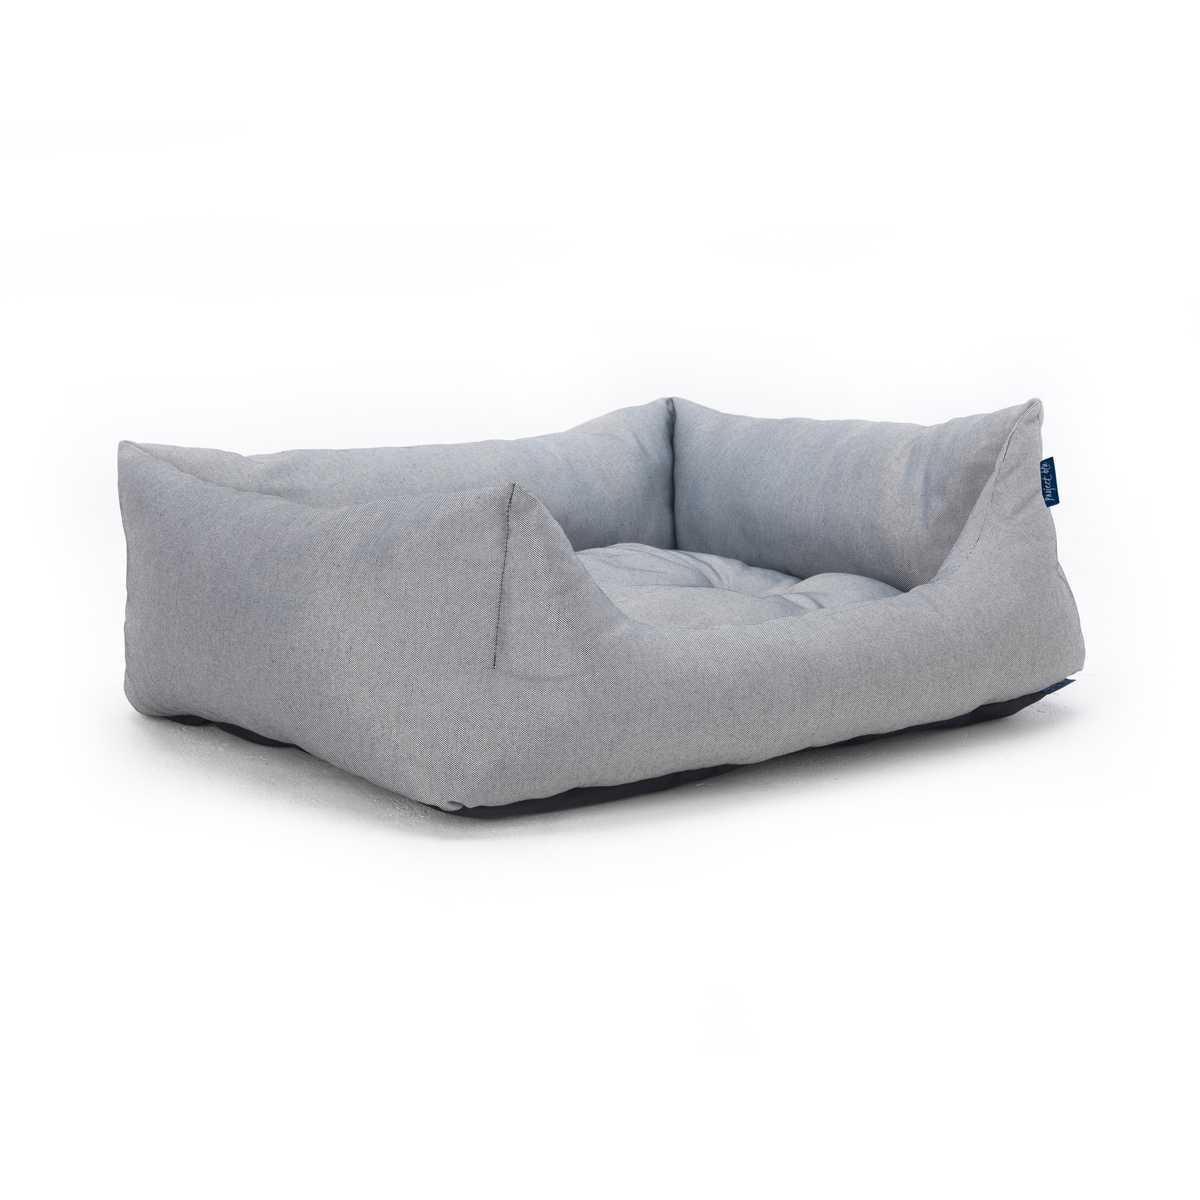 Pelech Adriatic - šedý ze strany